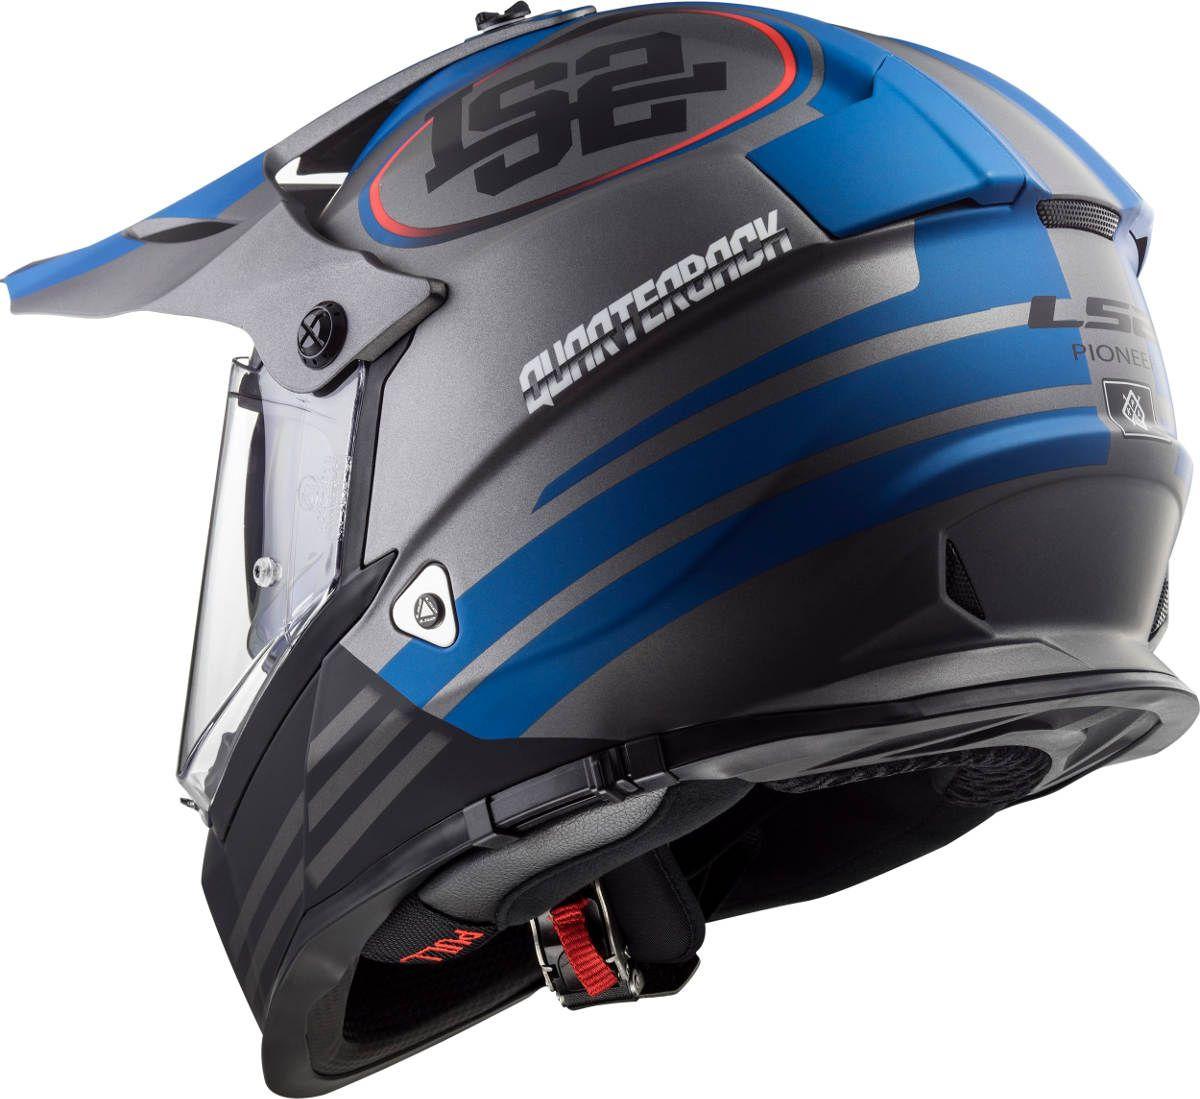 New LS2 Pioneer Dual Sport Helmet Colours Dual sport